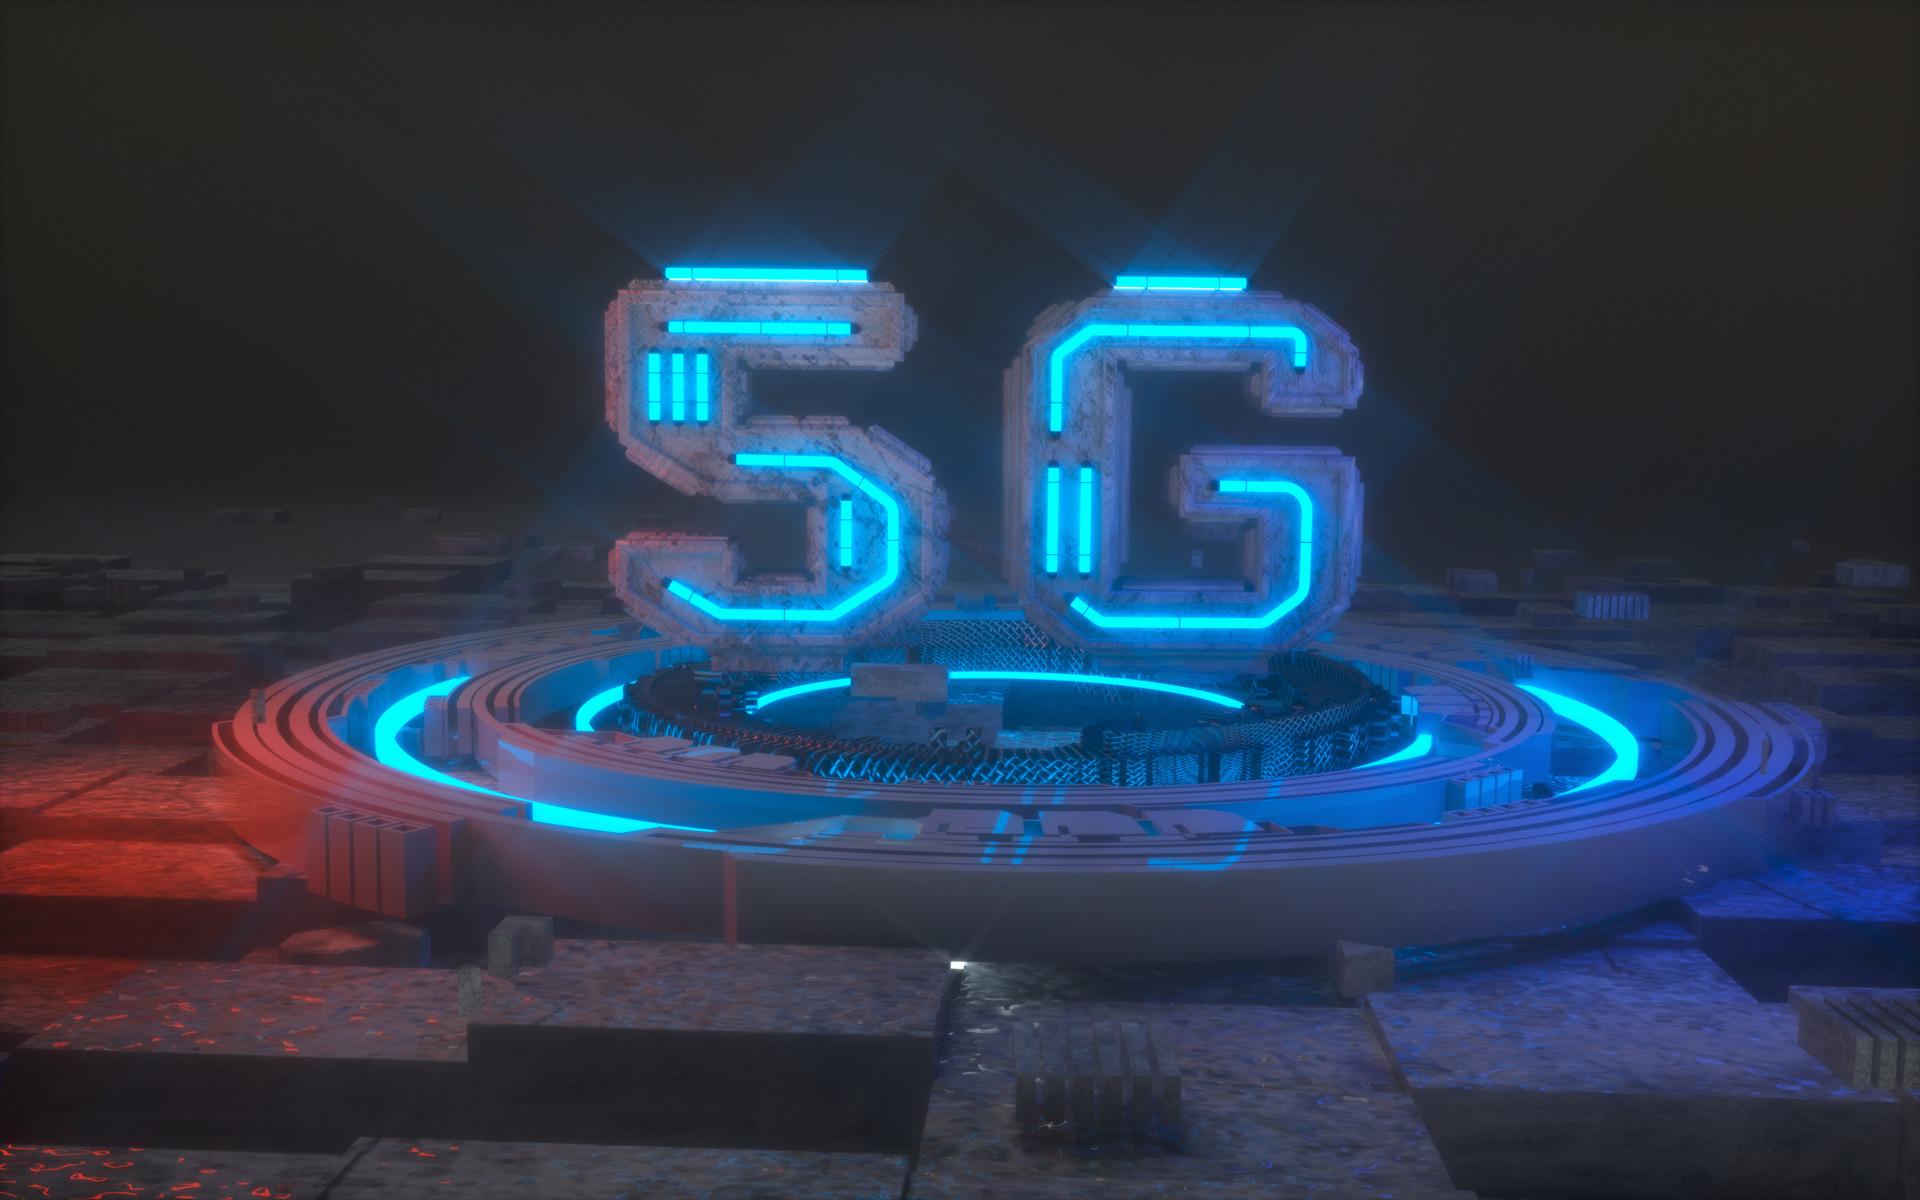 "5G已��6G也�_始""探路"" ��用范���⑦M一步拓展"